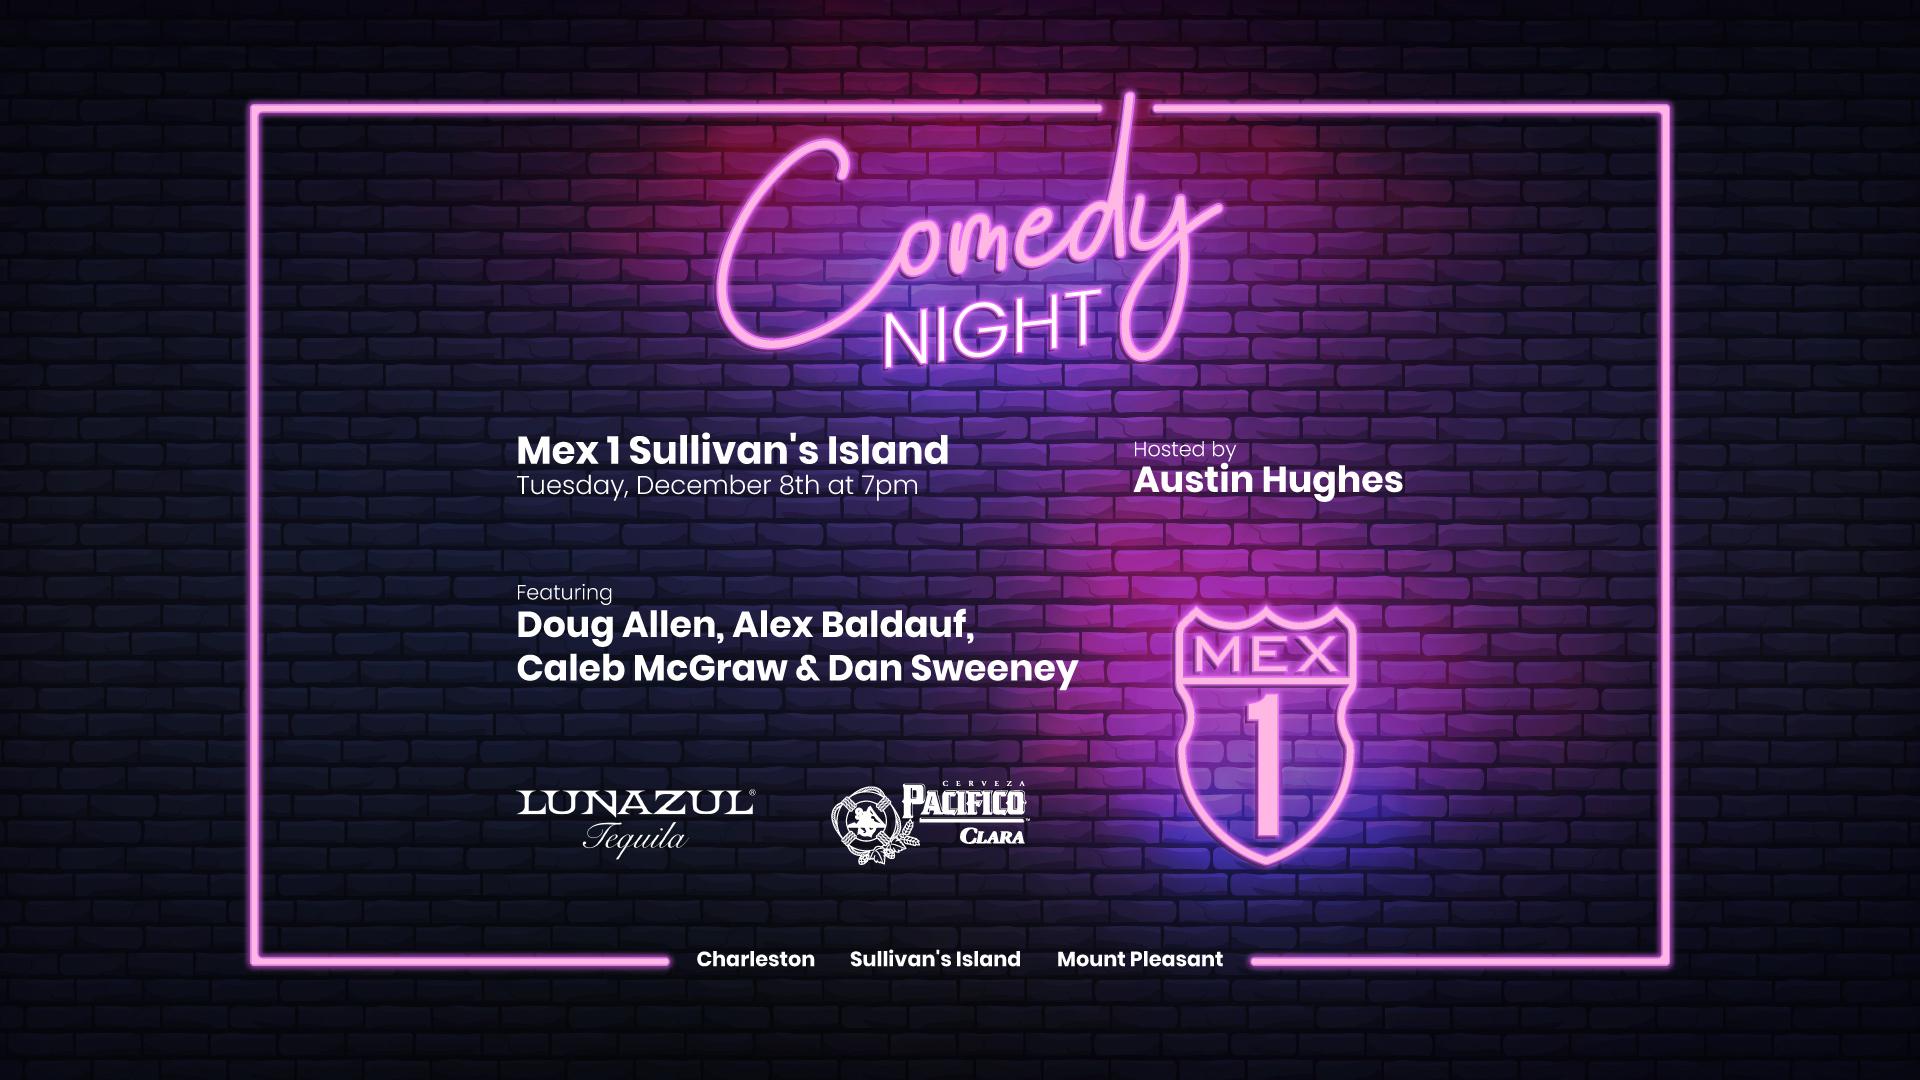 Comedy Night at Mex 1 Sullivan's Island